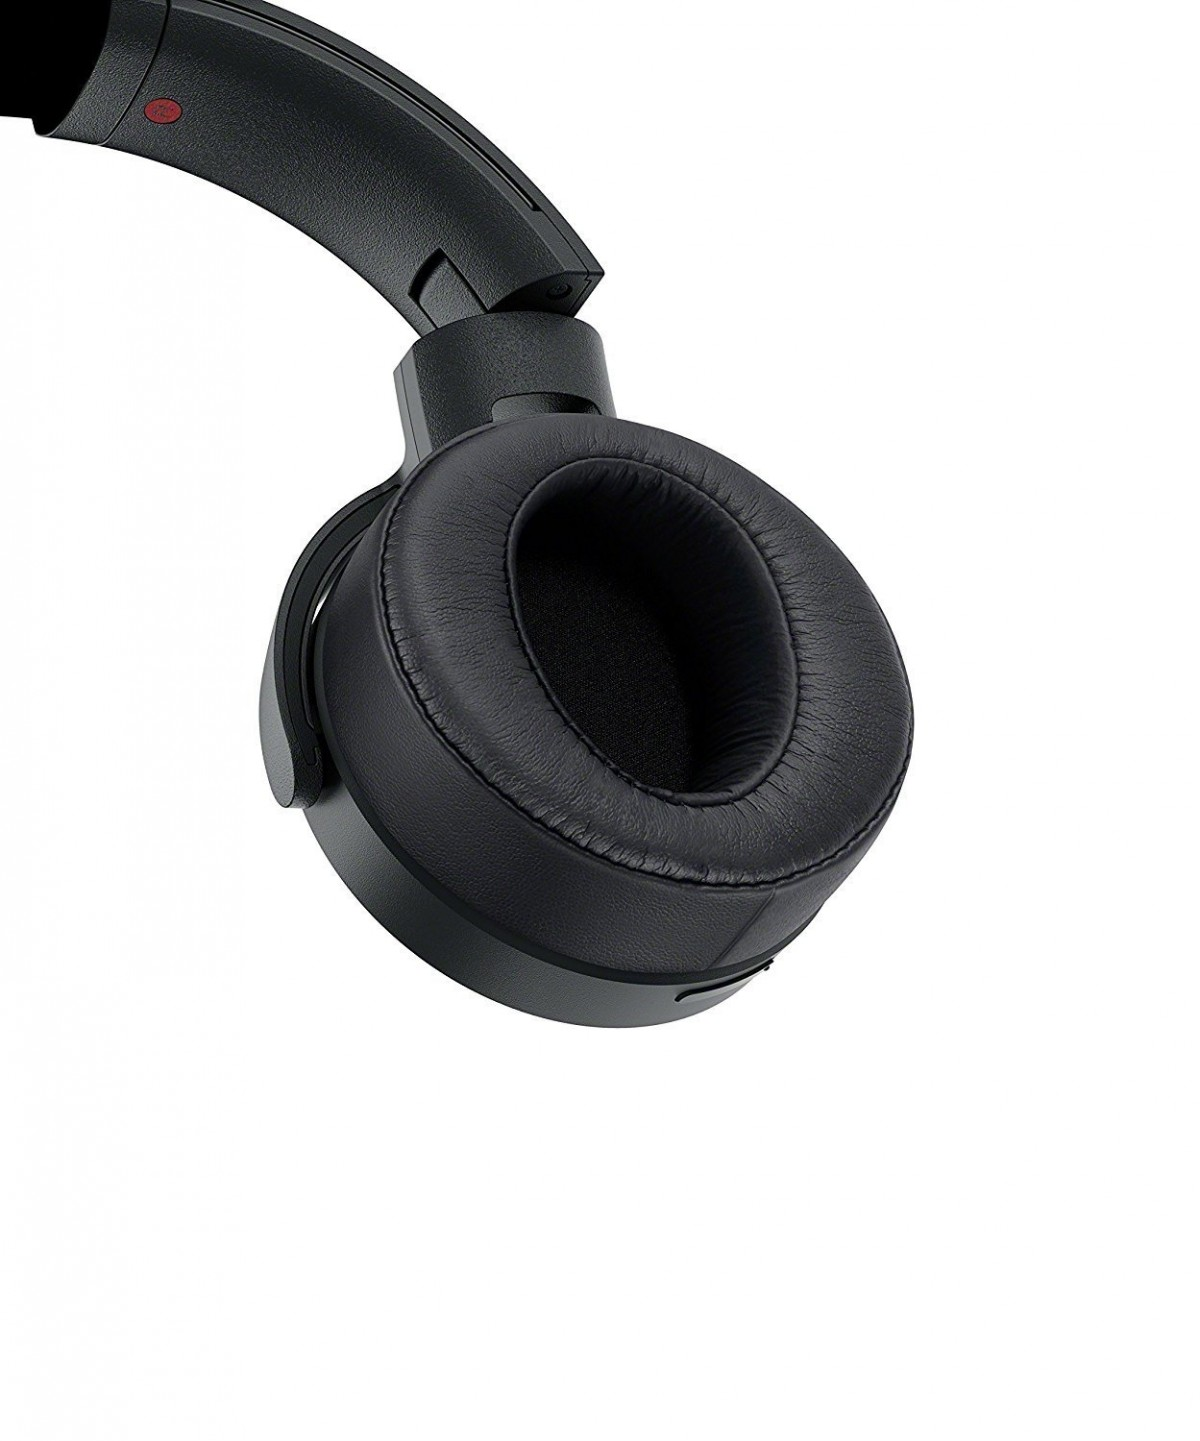 537b60eeddc Sony Extra Bass Wireless Bluetooth Over-Ear Headphones Black (MDR-XB950N1).  by Inovi Technologies